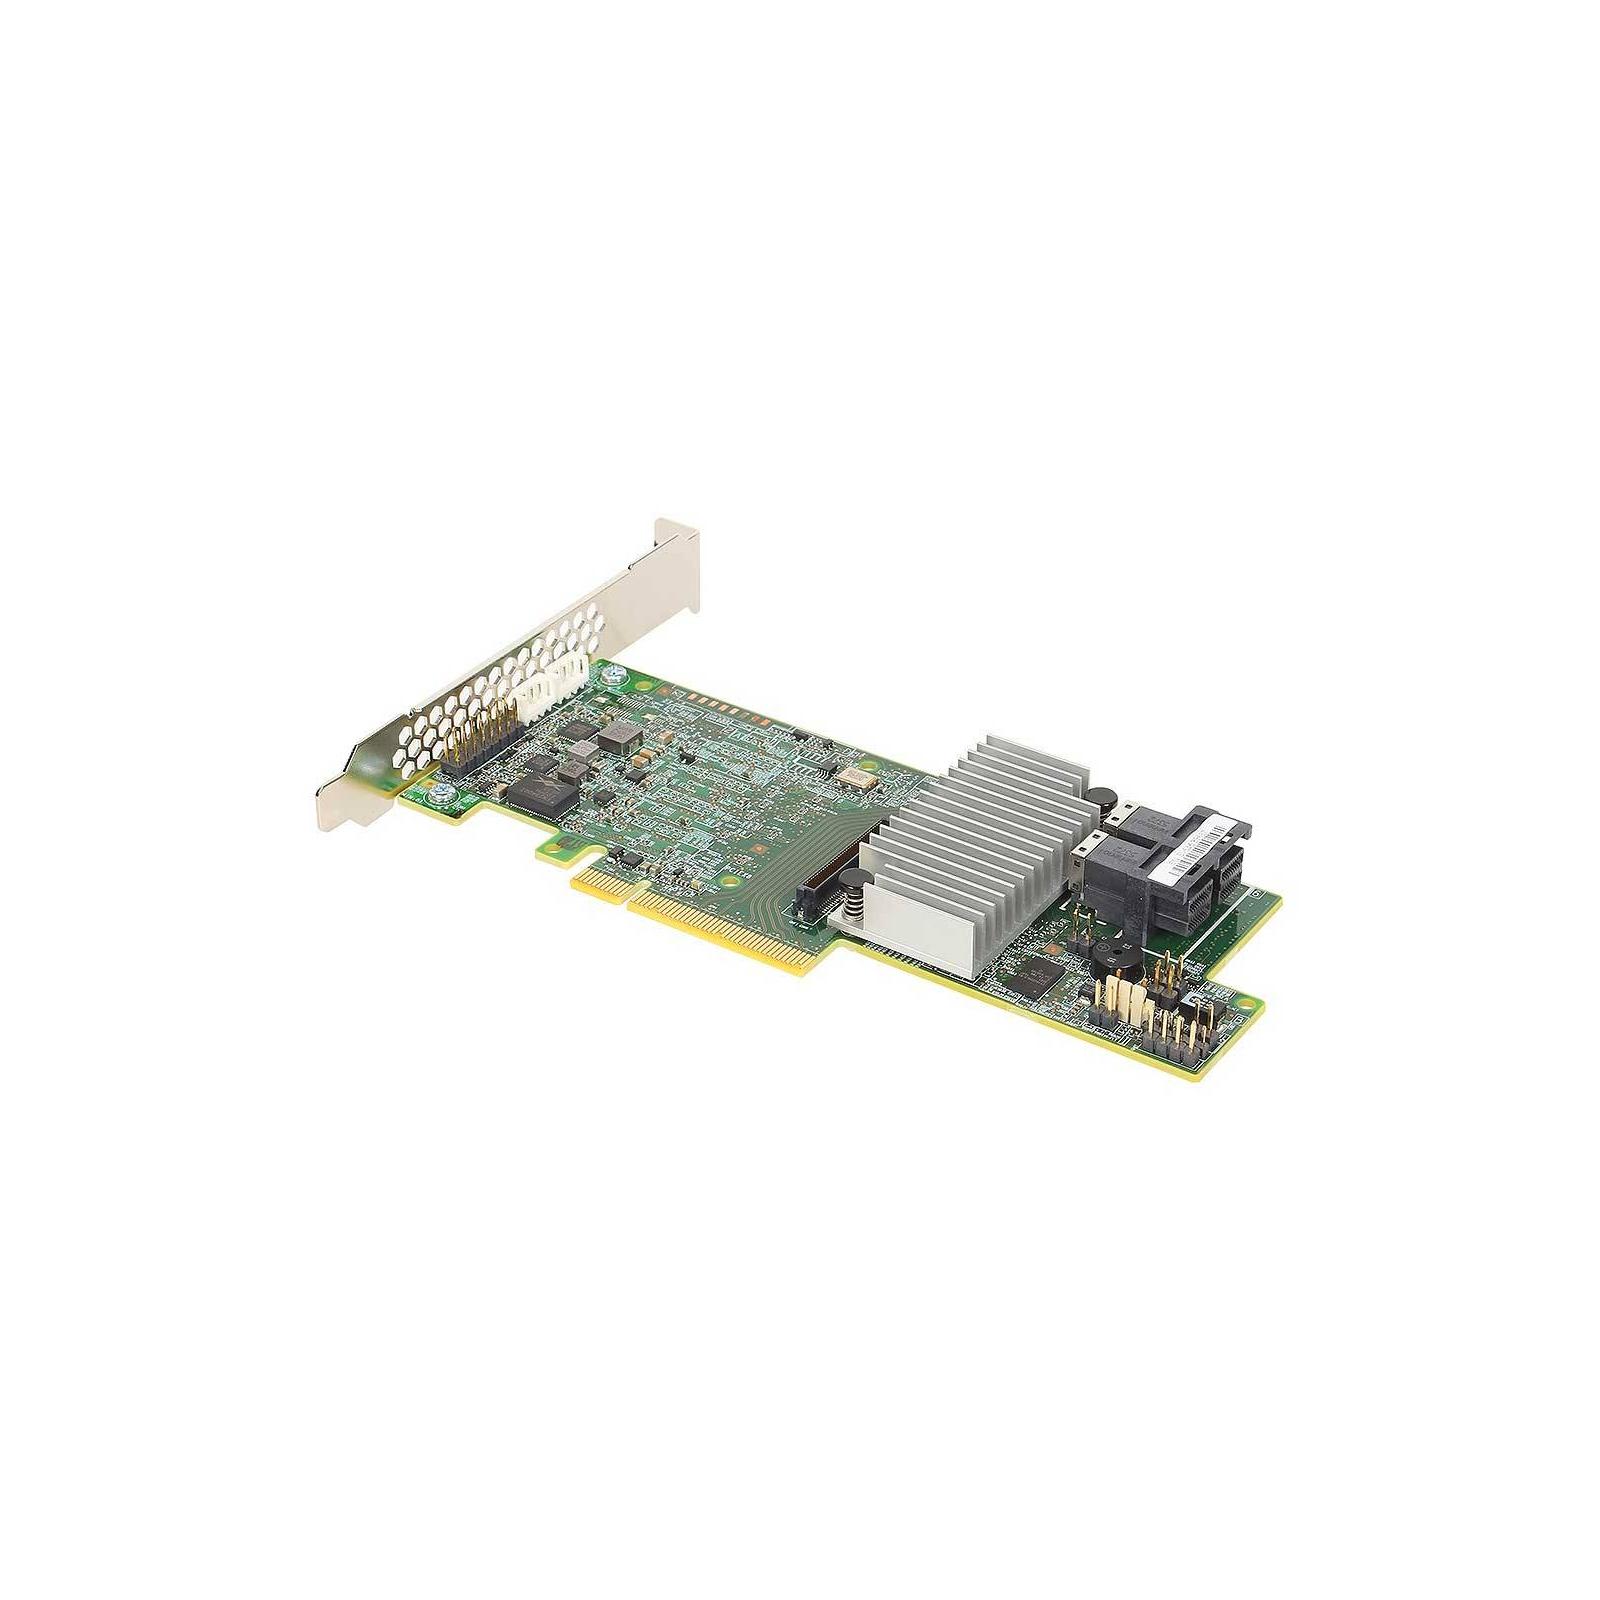 Контроллер RAID LSI MegaRAID SAS 9361-8i (1GB) (05-25420-08) изображение 2